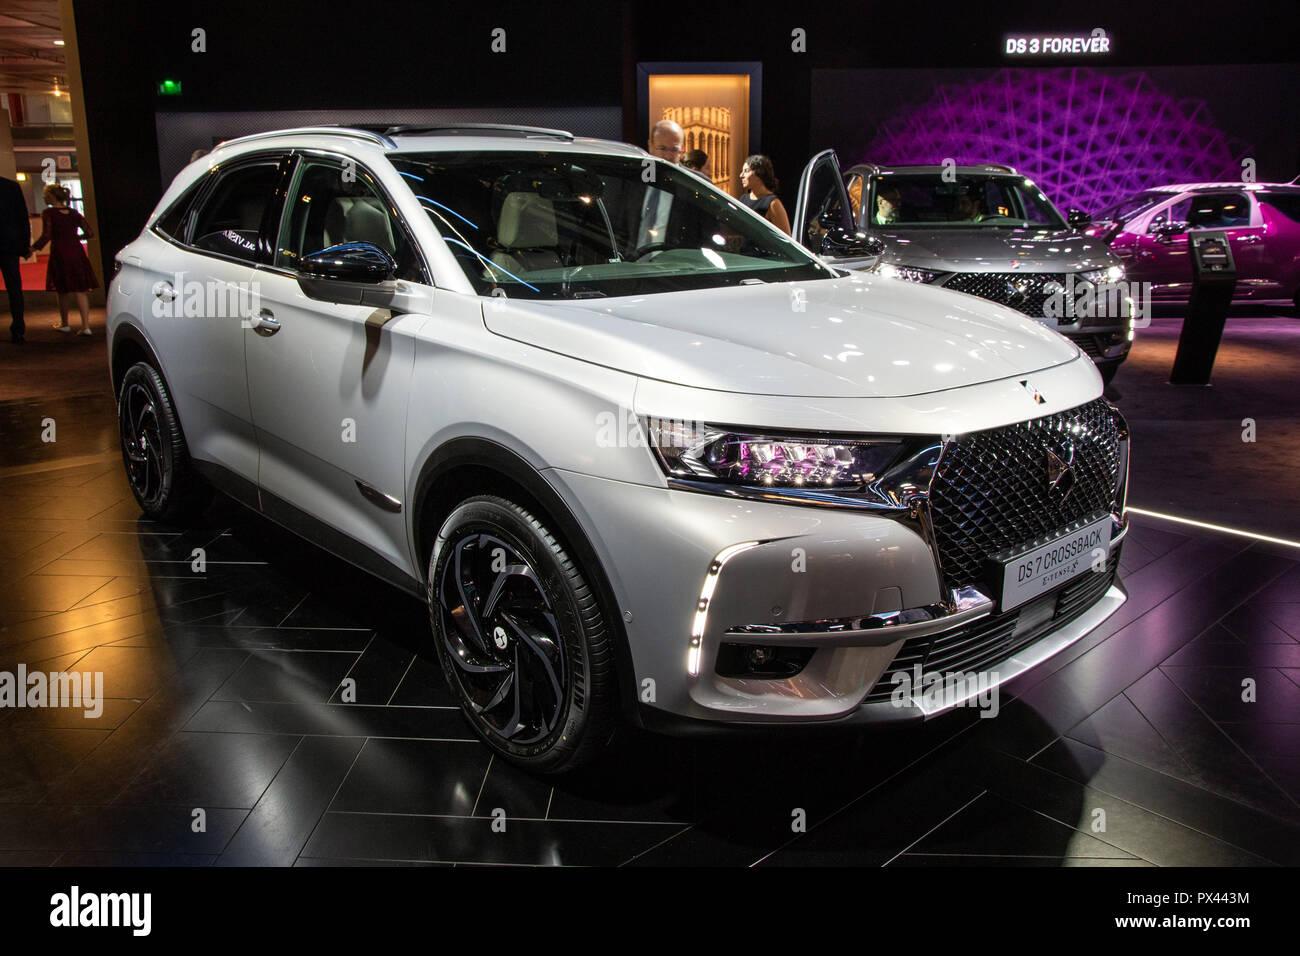 paris oct 2 2018 citroen ds7 crossback e tense car showcased at the paris motor show stock. Black Bedroom Furniture Sets. Home Design Ideas